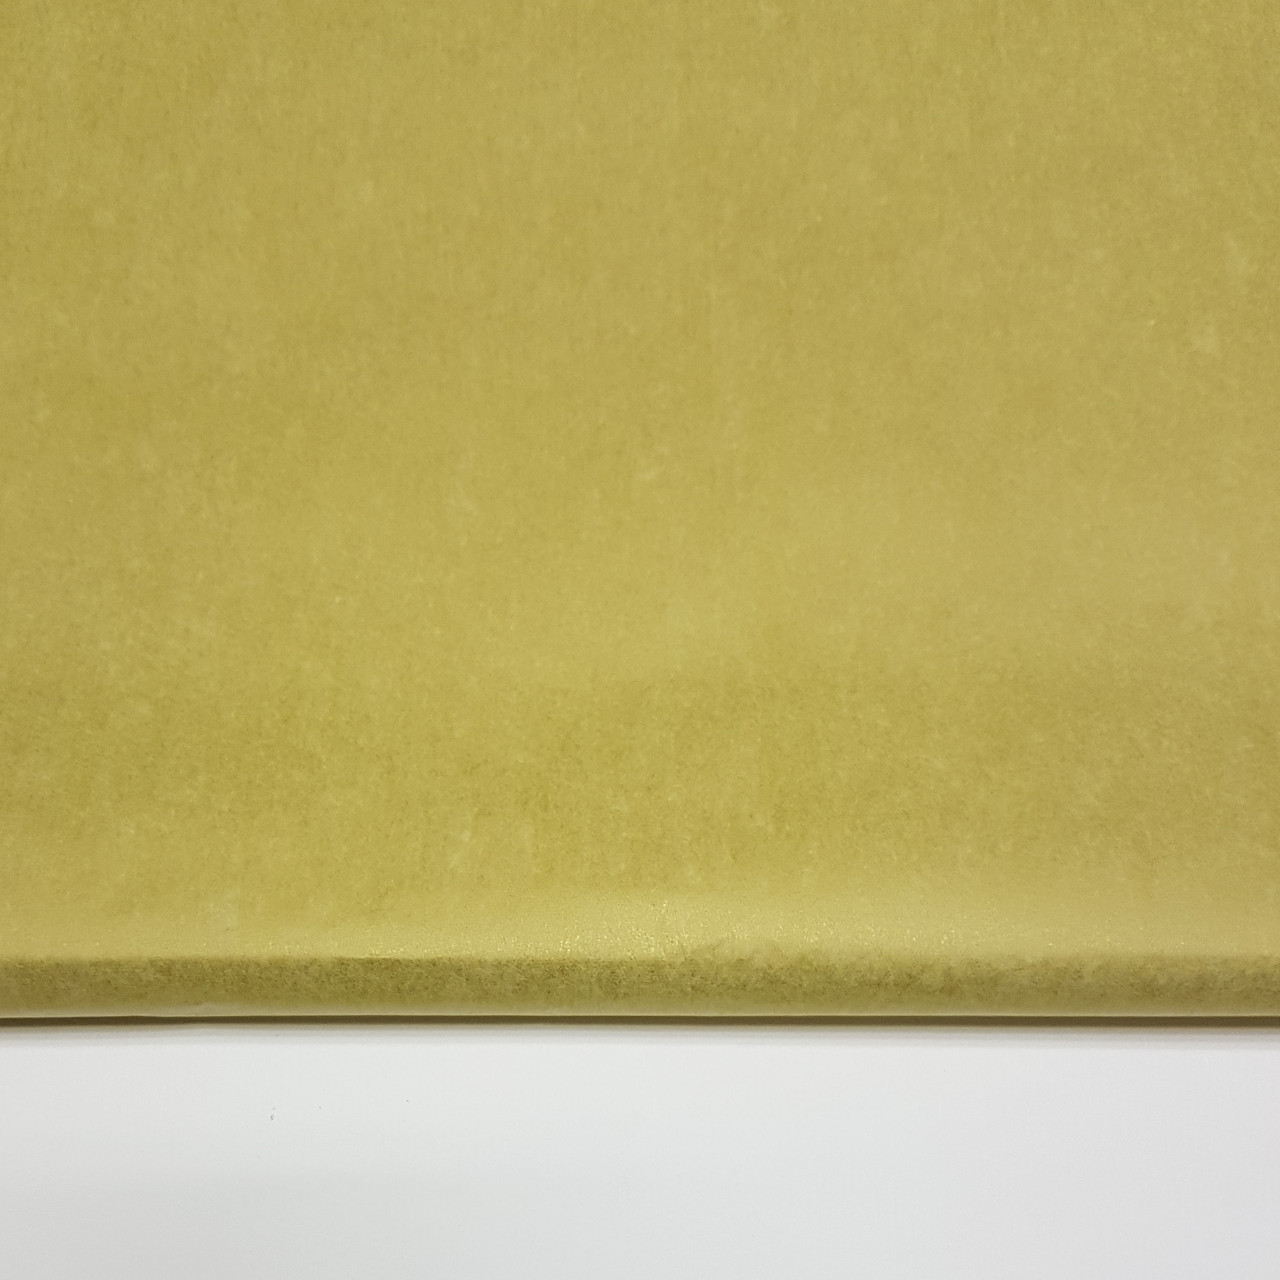 Бумага тишью золото 100шт.